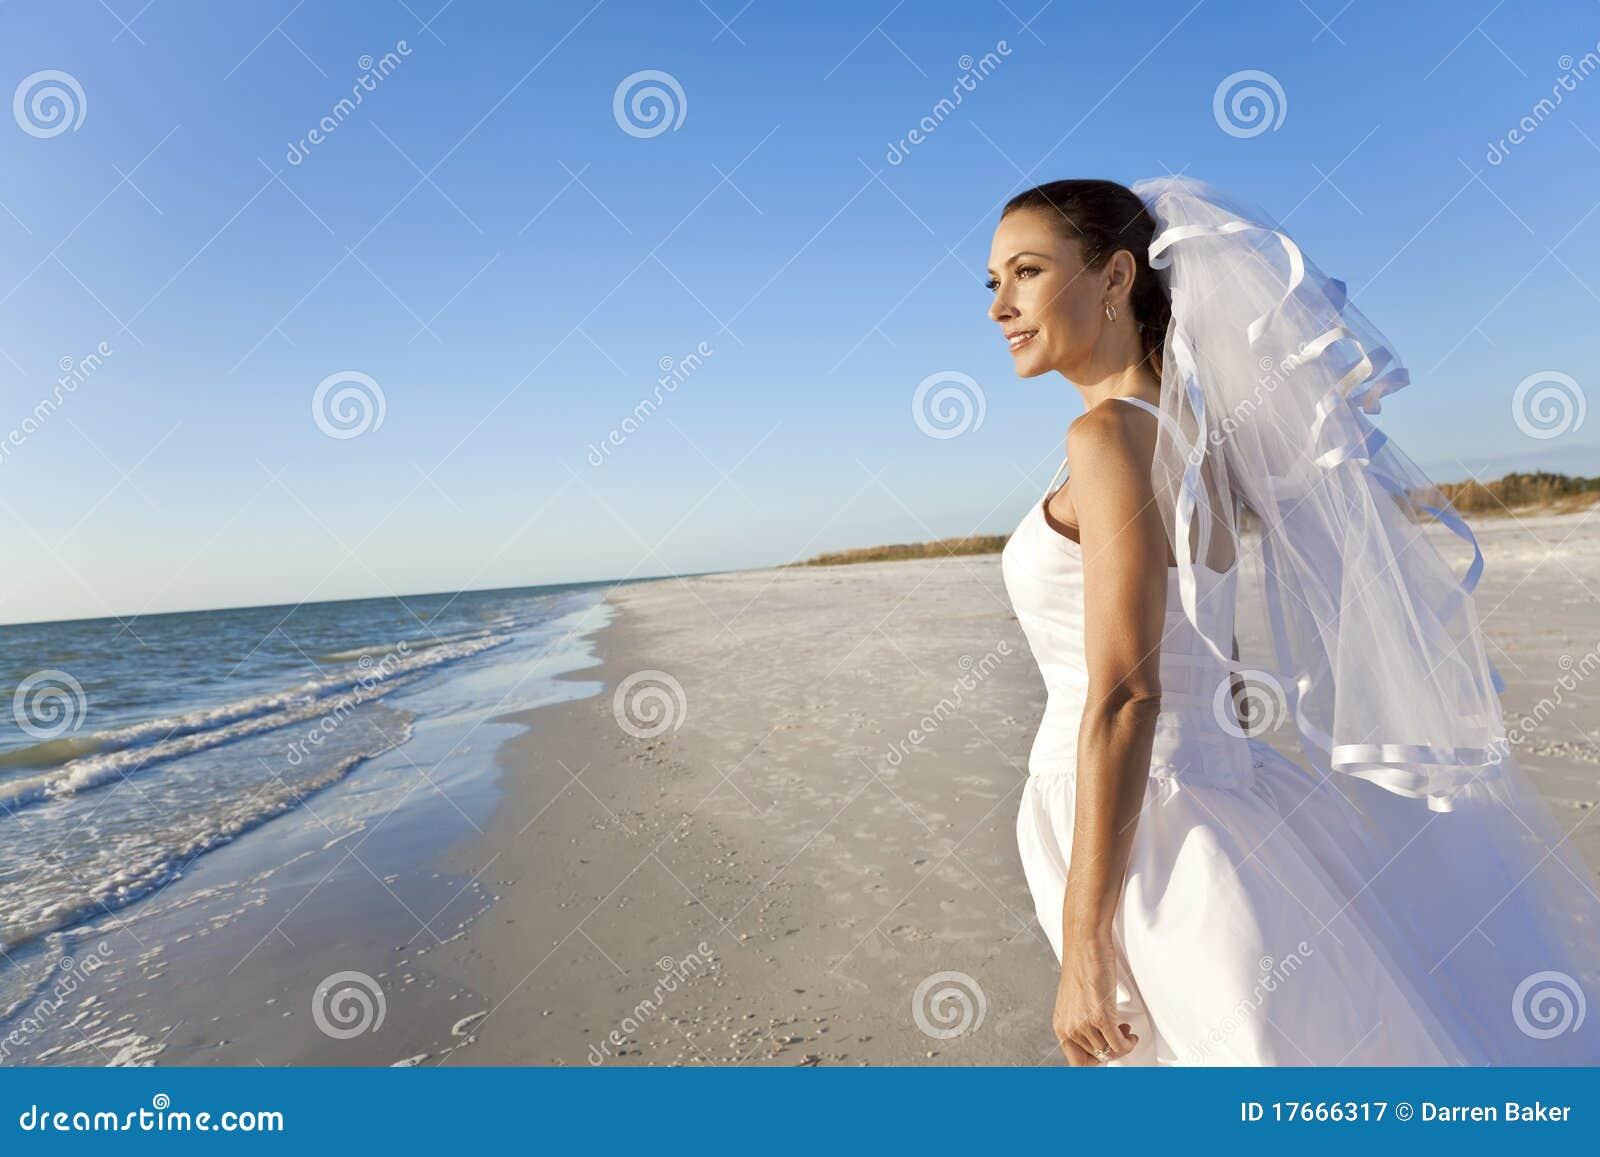 Bride at Beach Wedding